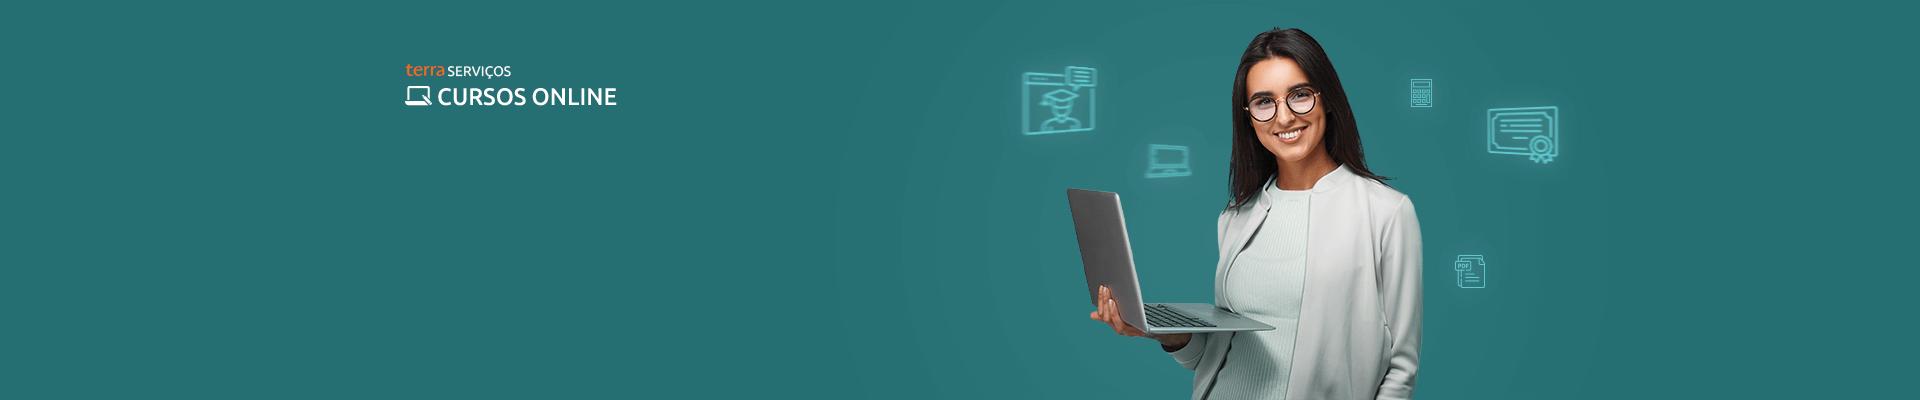 Cursos online – Desktop